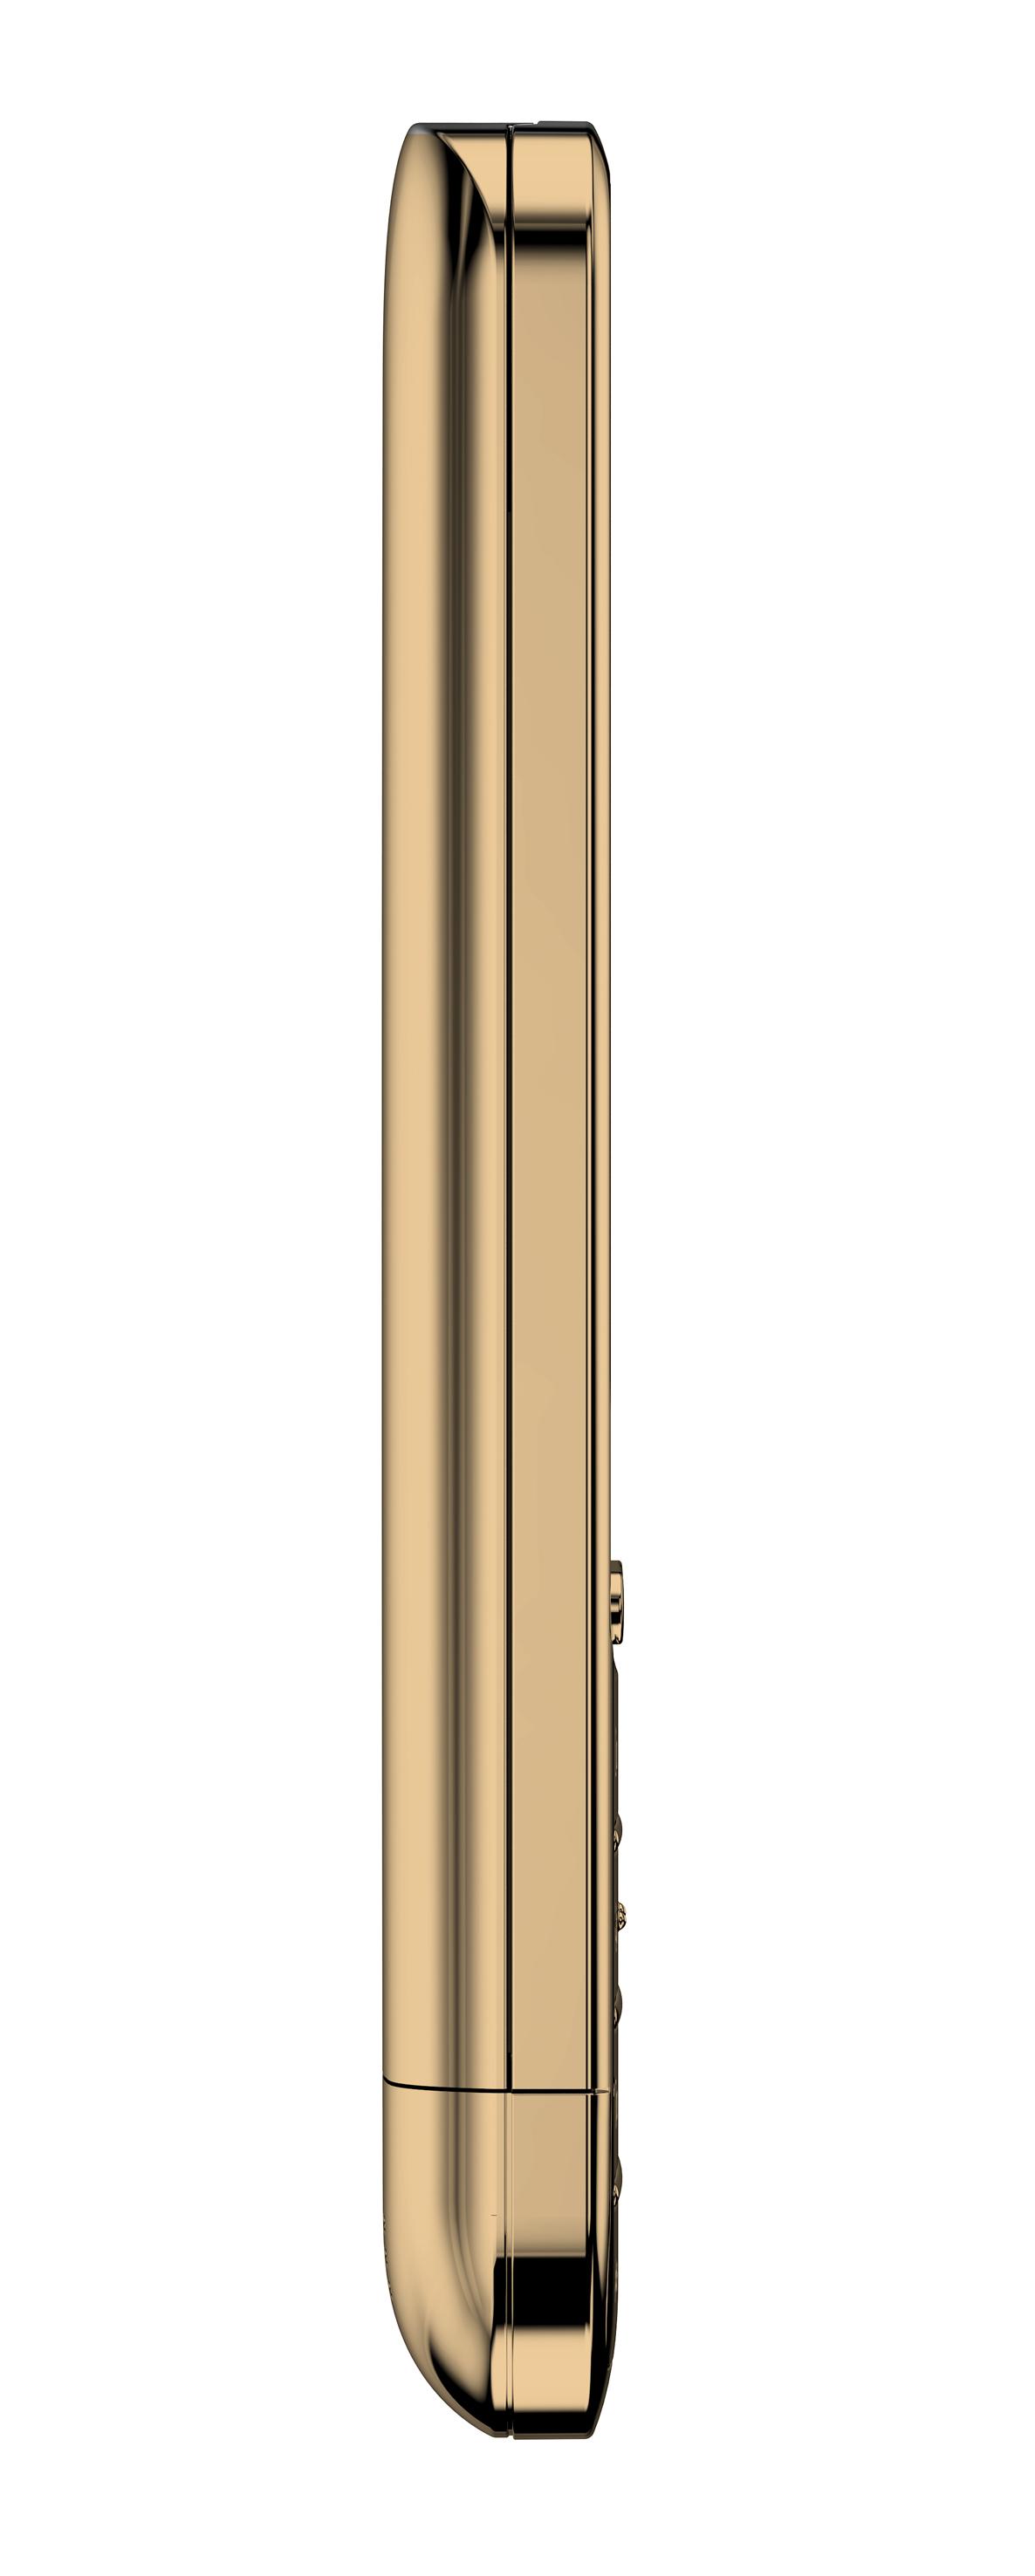 Nokia-C3-01-Gold-Edition-4Nokia C3 Gold